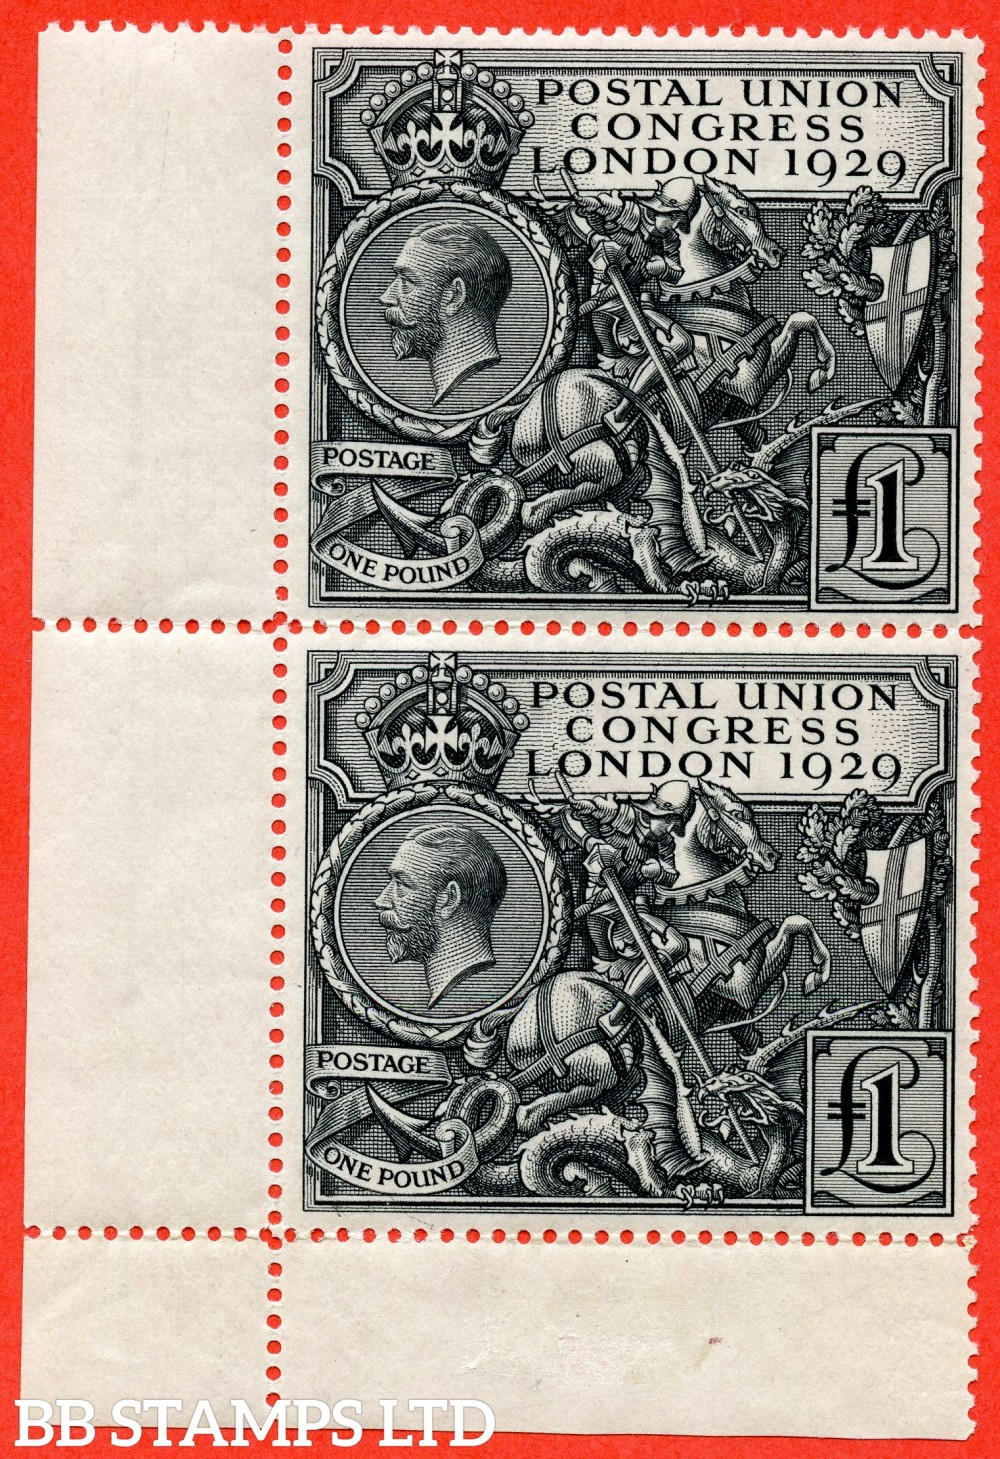 SG. 438. NCom9. £1.00 Postal Union Congress. A fine UNMOUNTED MINT left hand corner marginal vertical pair.